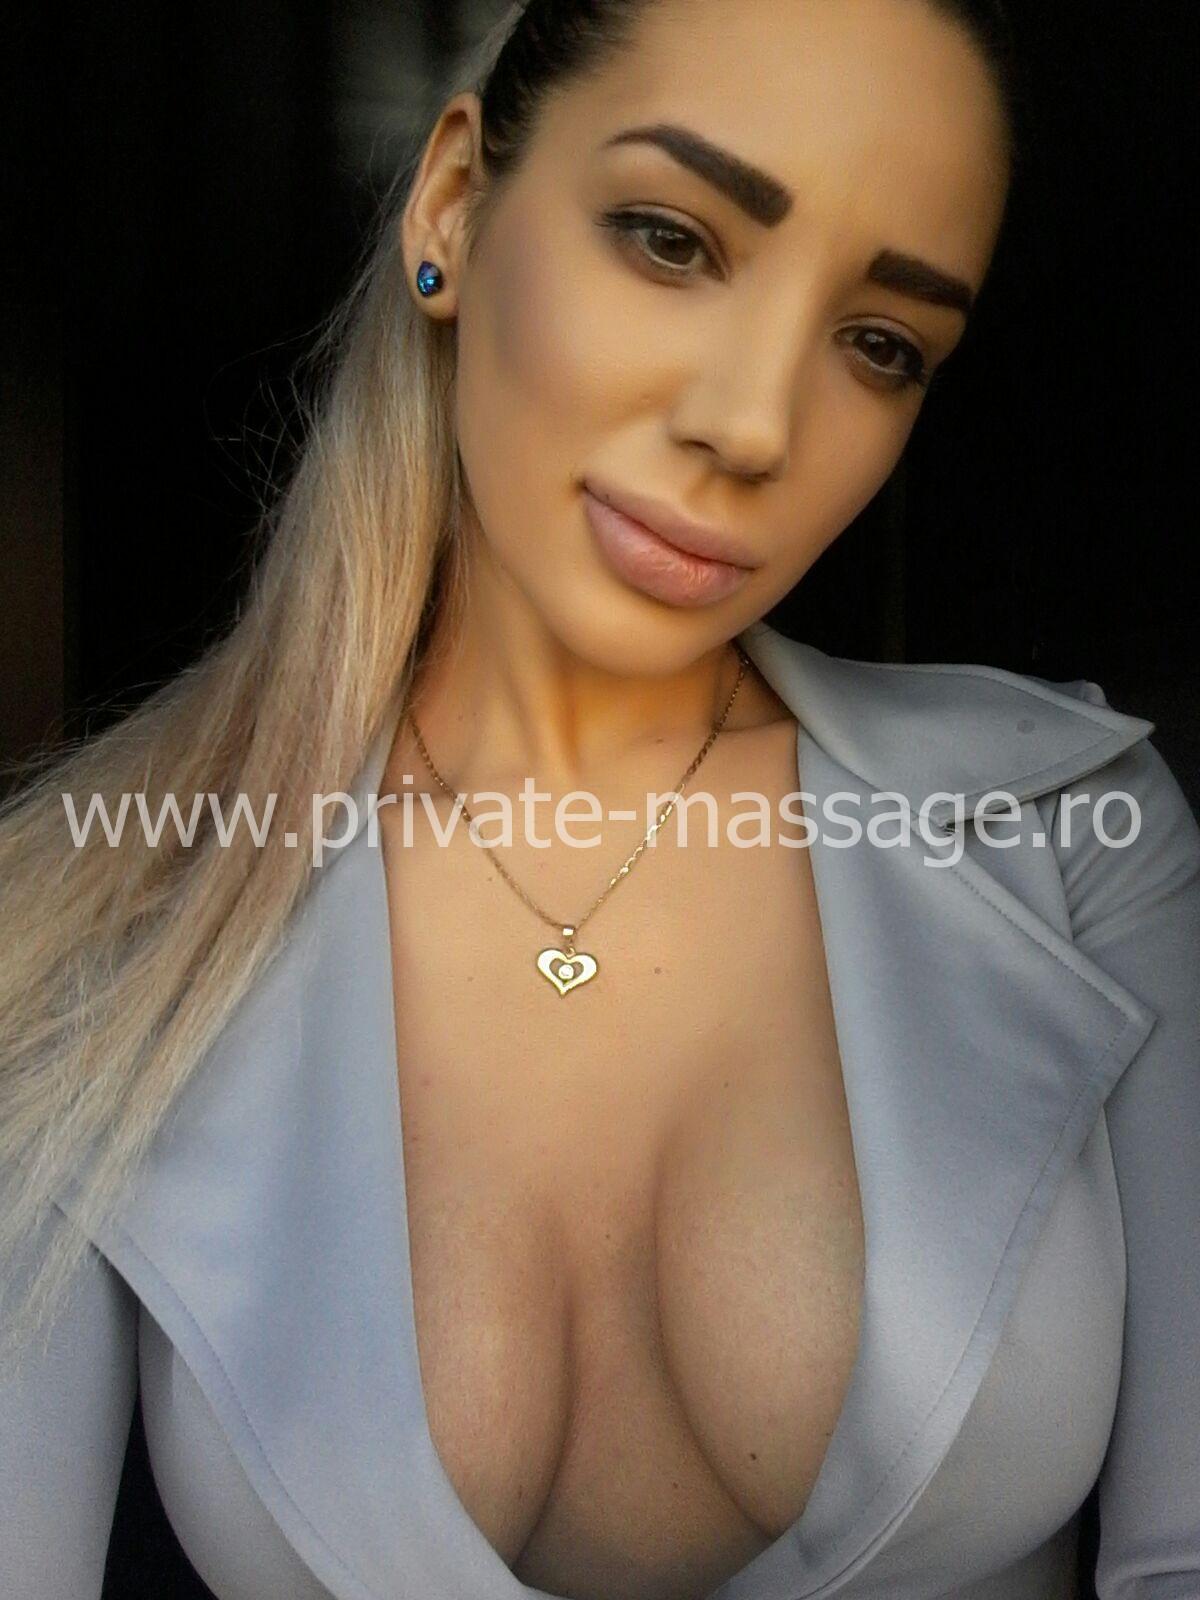 anabelle-masaj-erotic-photo5.jpeg